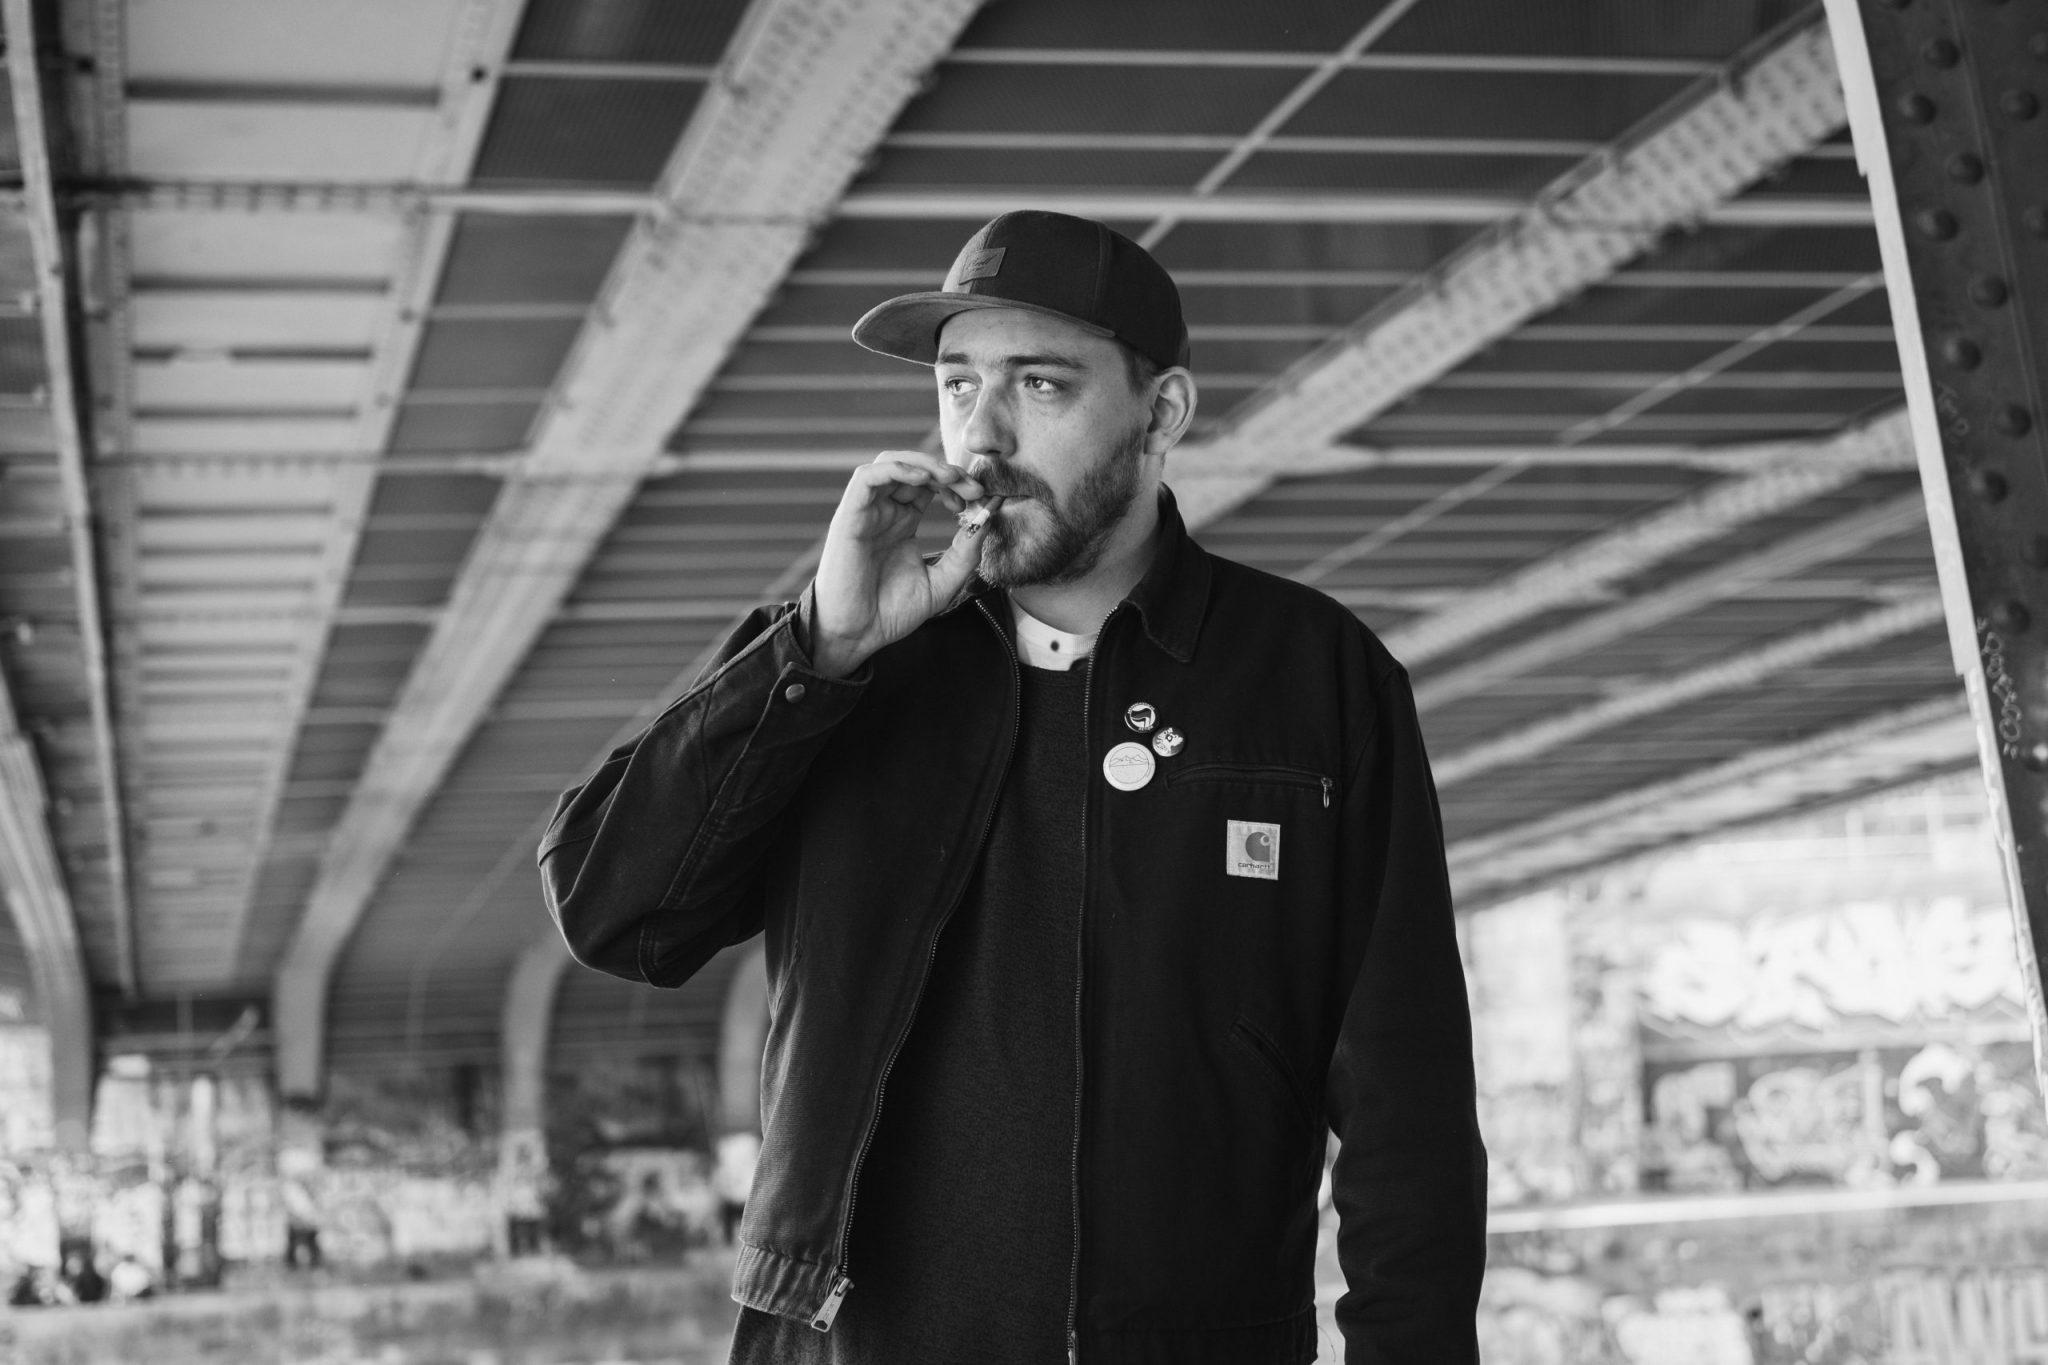 Selbstlaut Donaukanal Porträt Interview